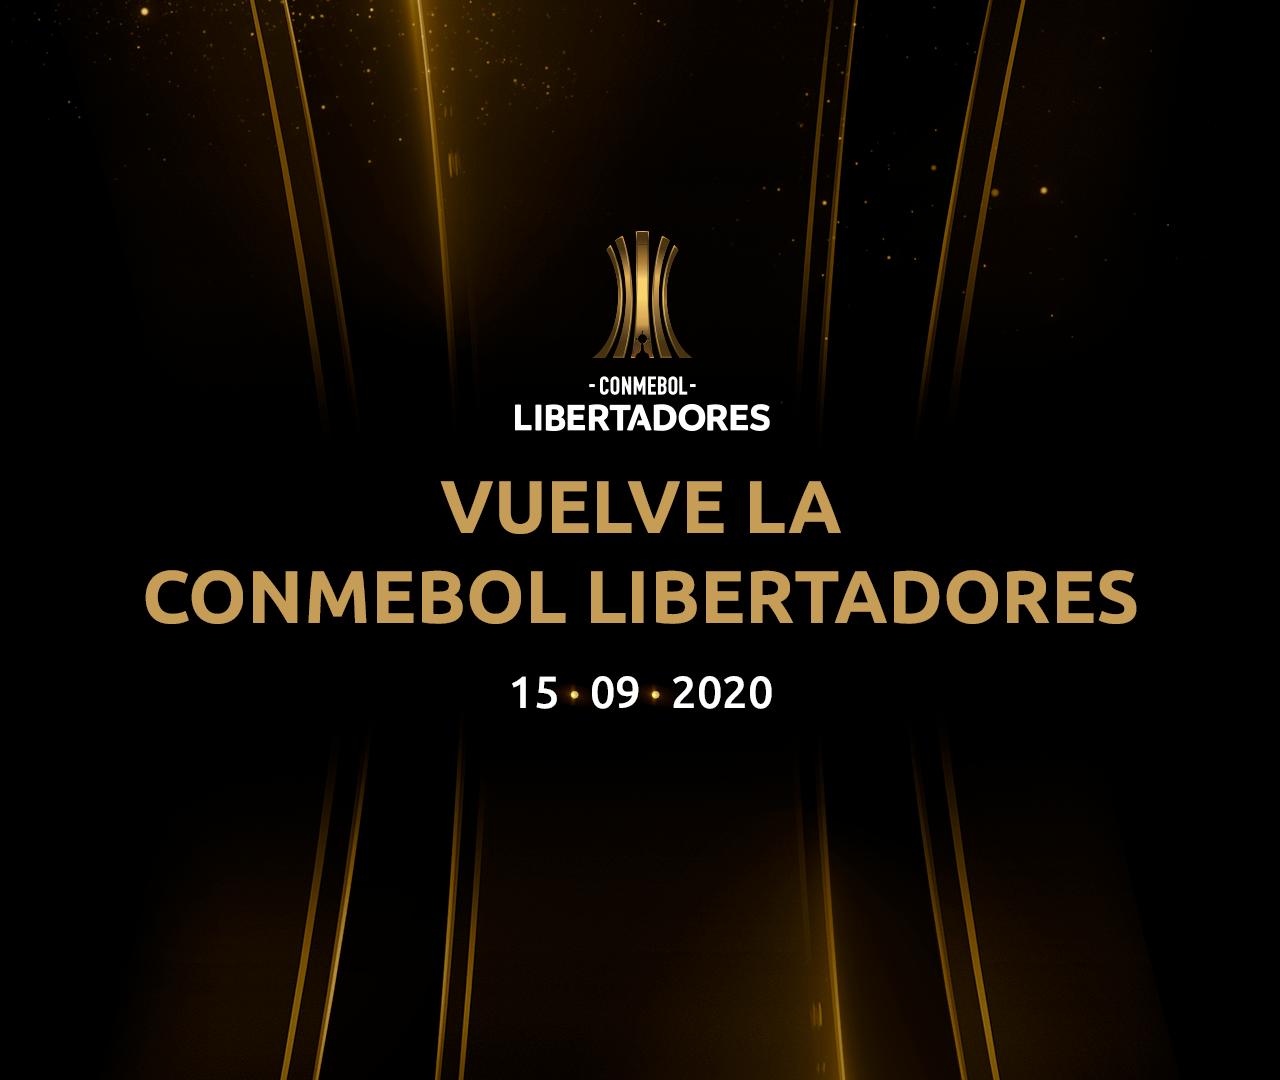 Vuelta de la CONMEBOL Libertadores 2020